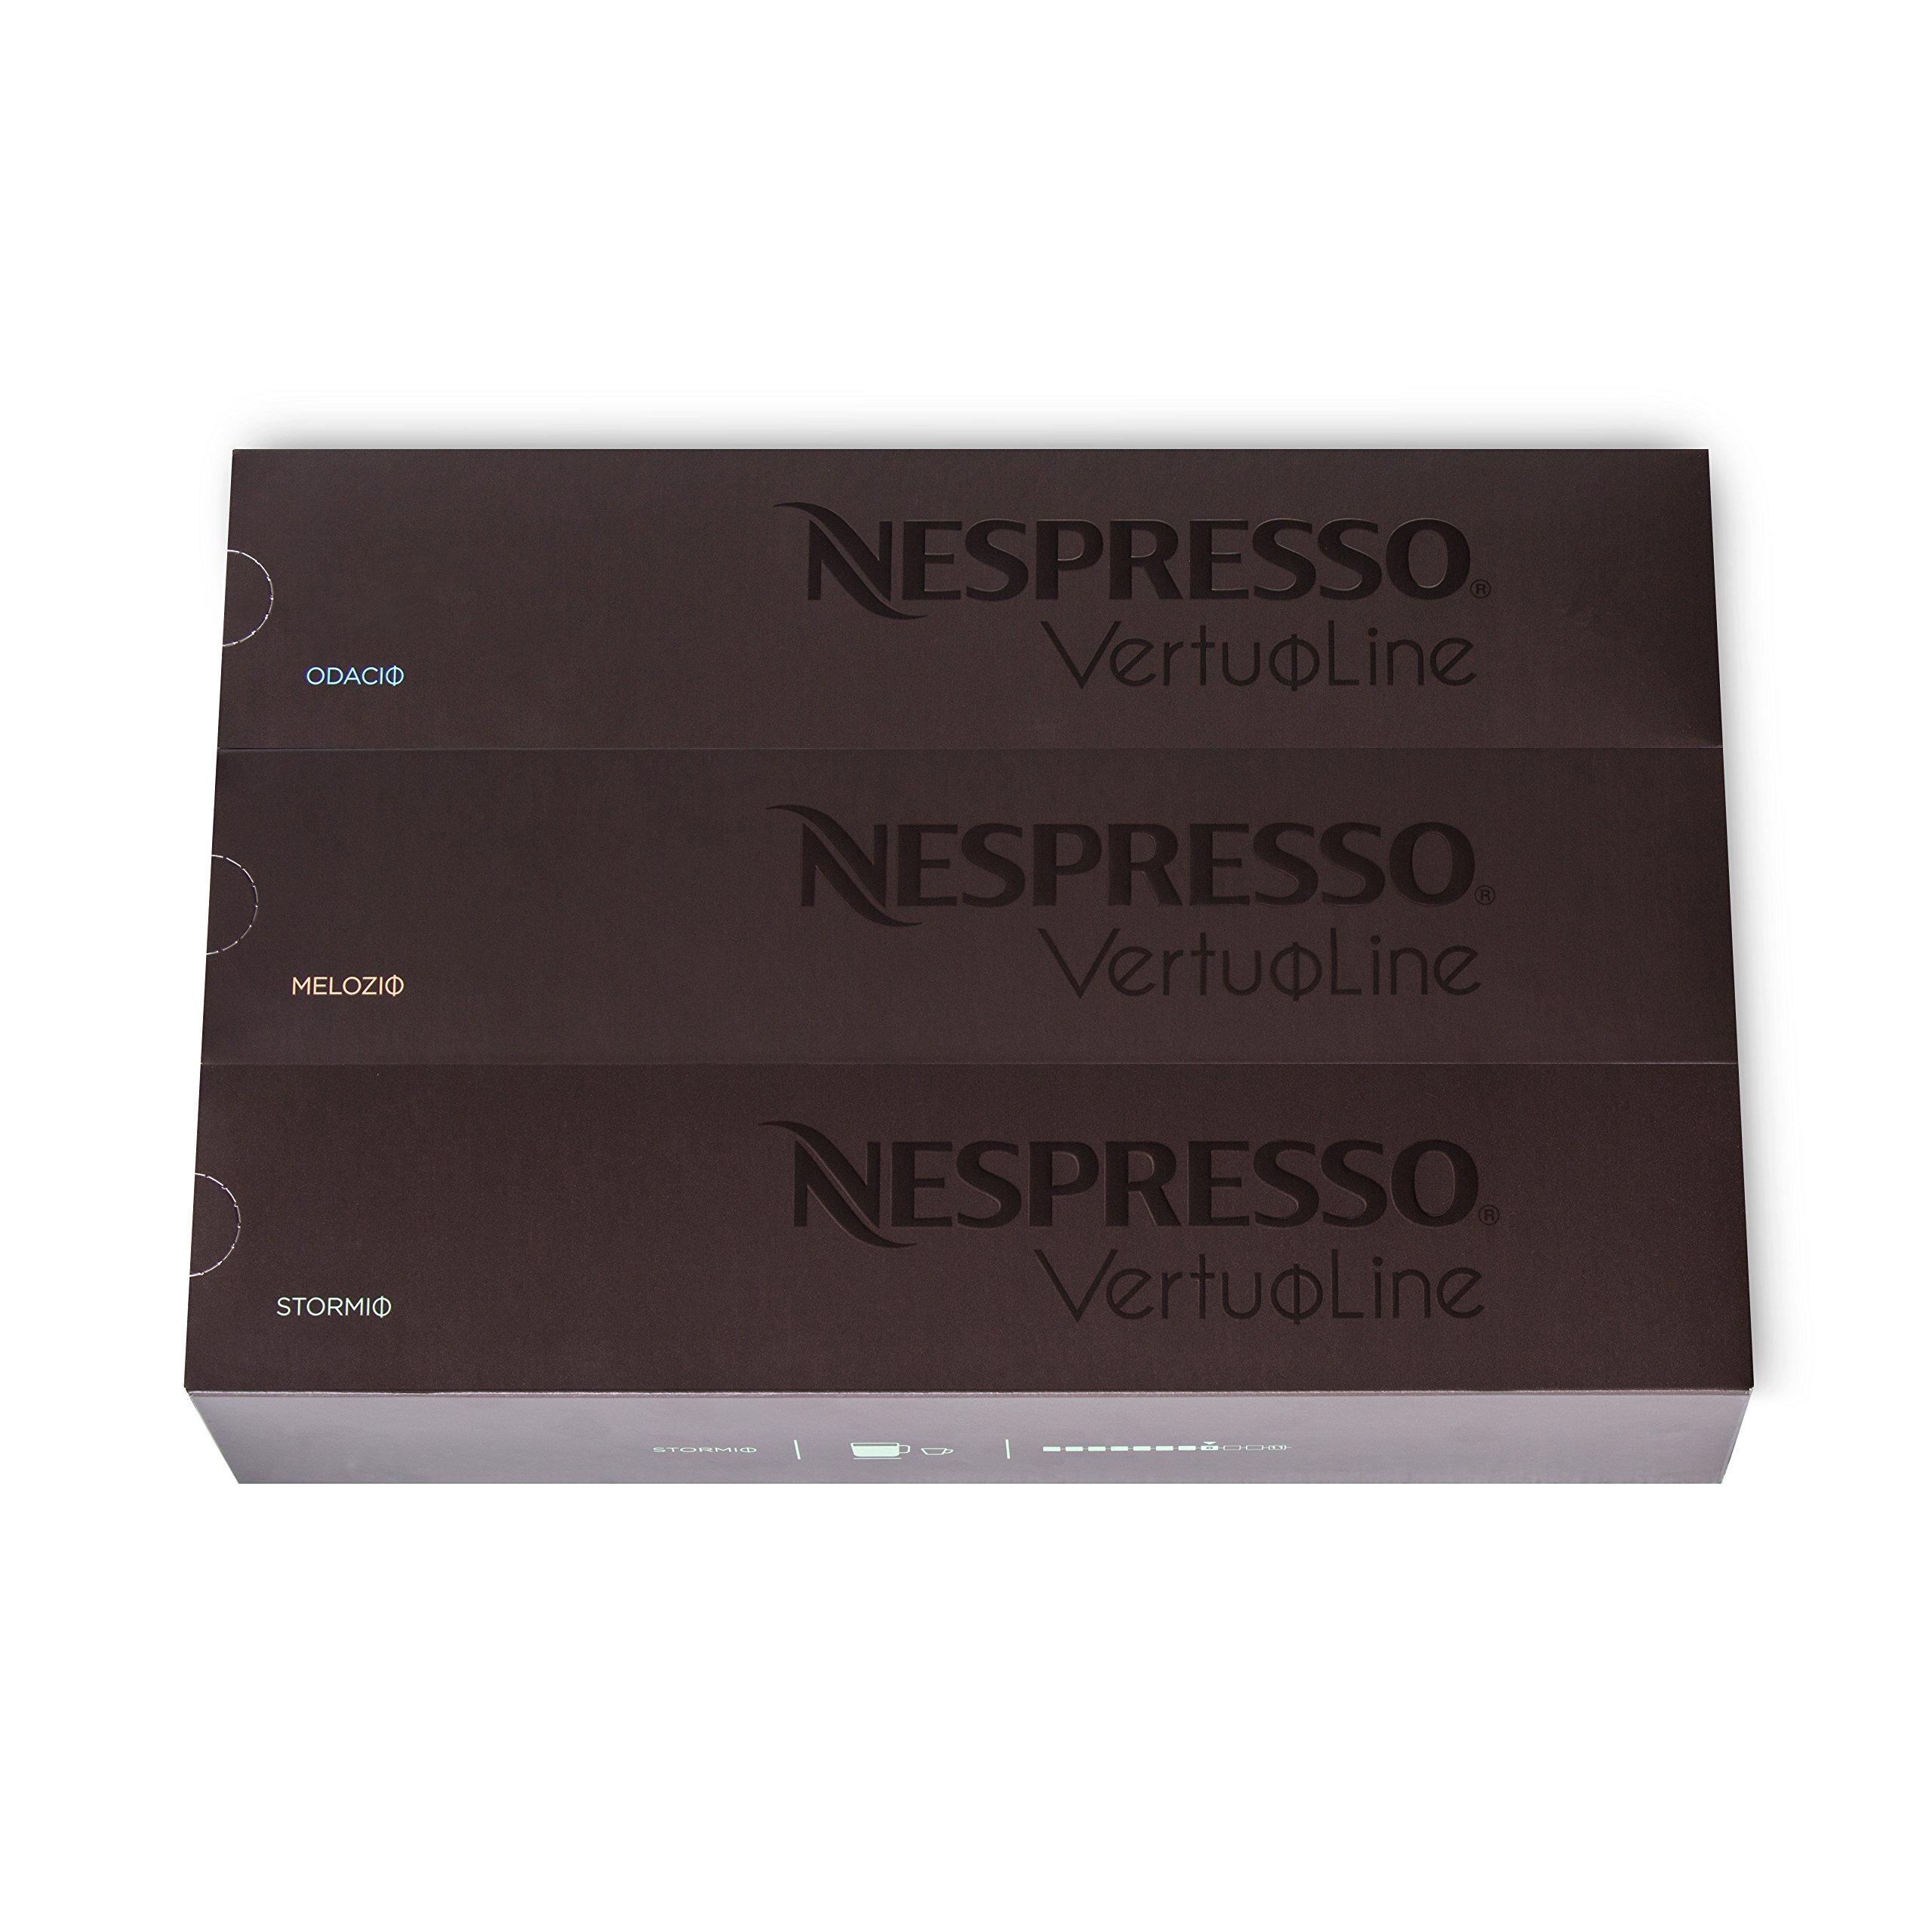 Nespresso Vertuoline Best Seller Assortment, 10 Count (Pack of 3) by Nespresso (Image #5)